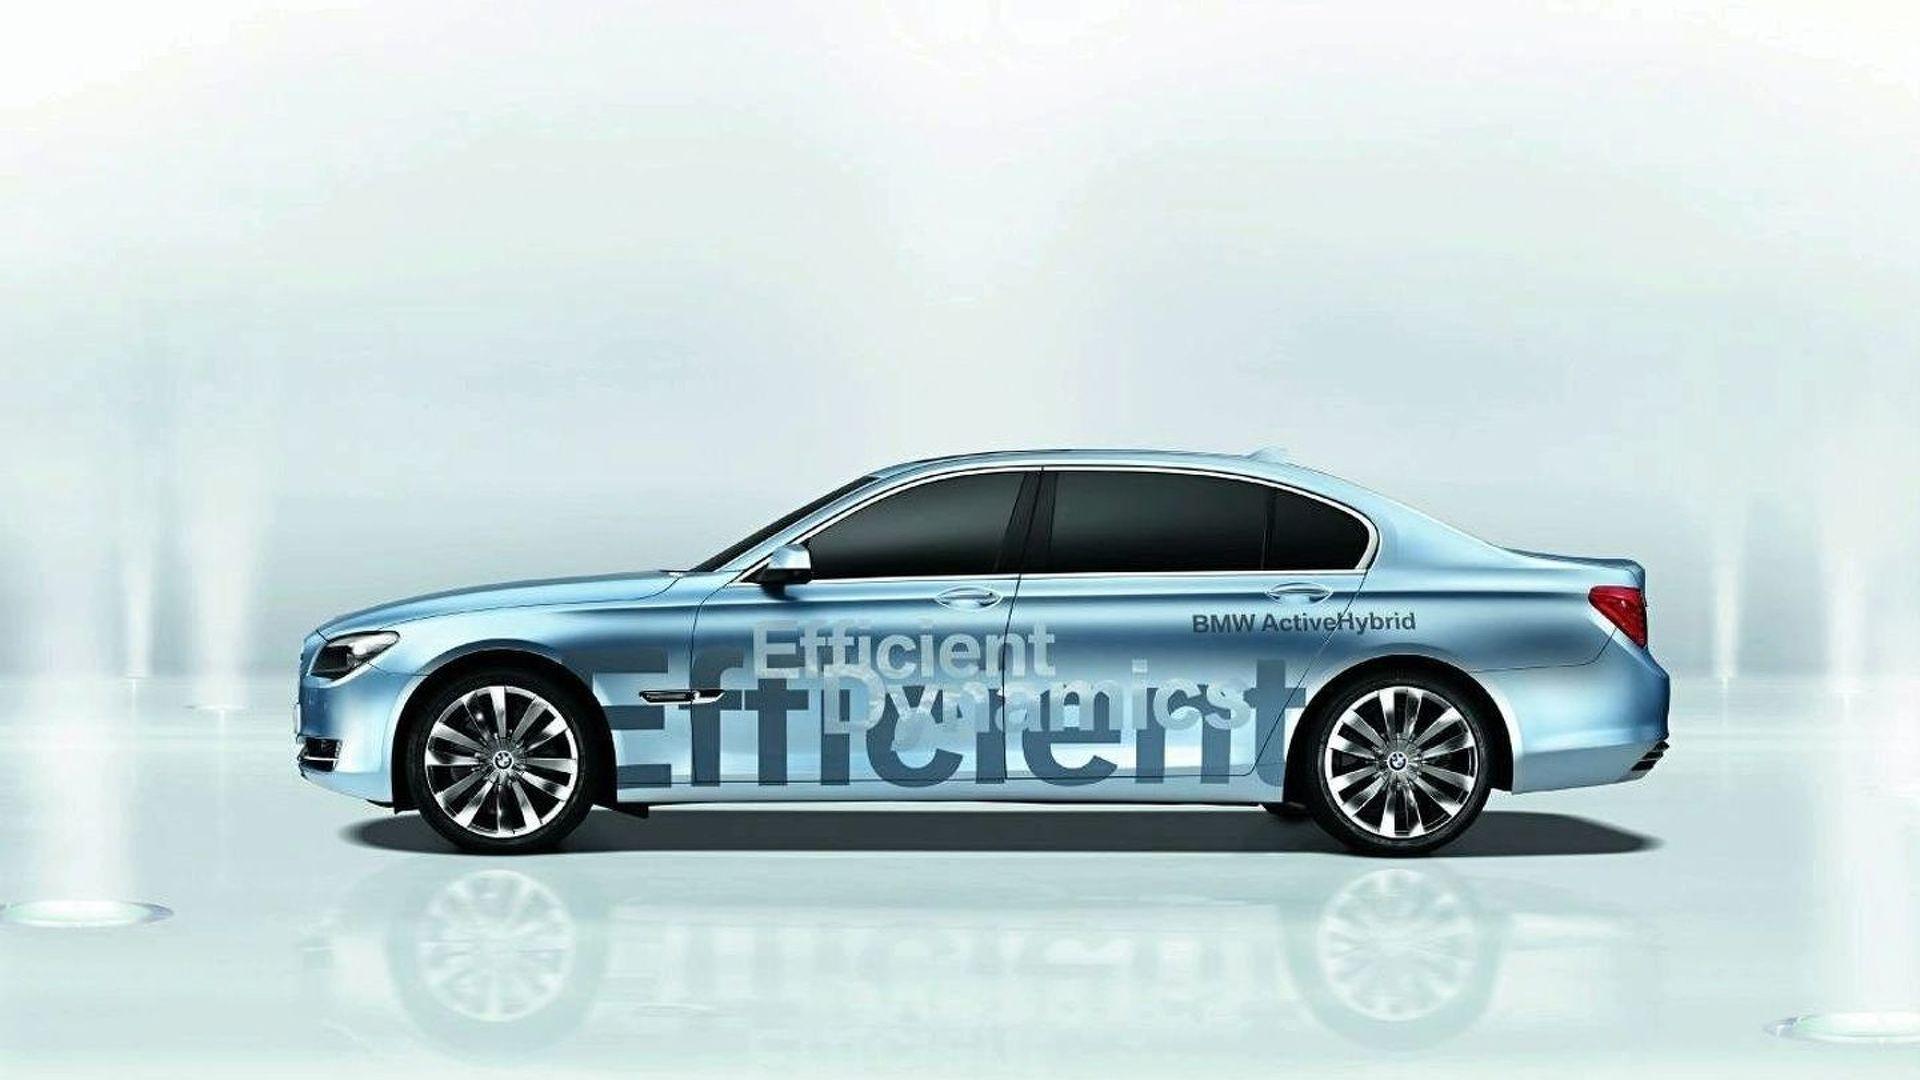 BMW\'s Next Generation EfficientDynamics Being Developed with NASA